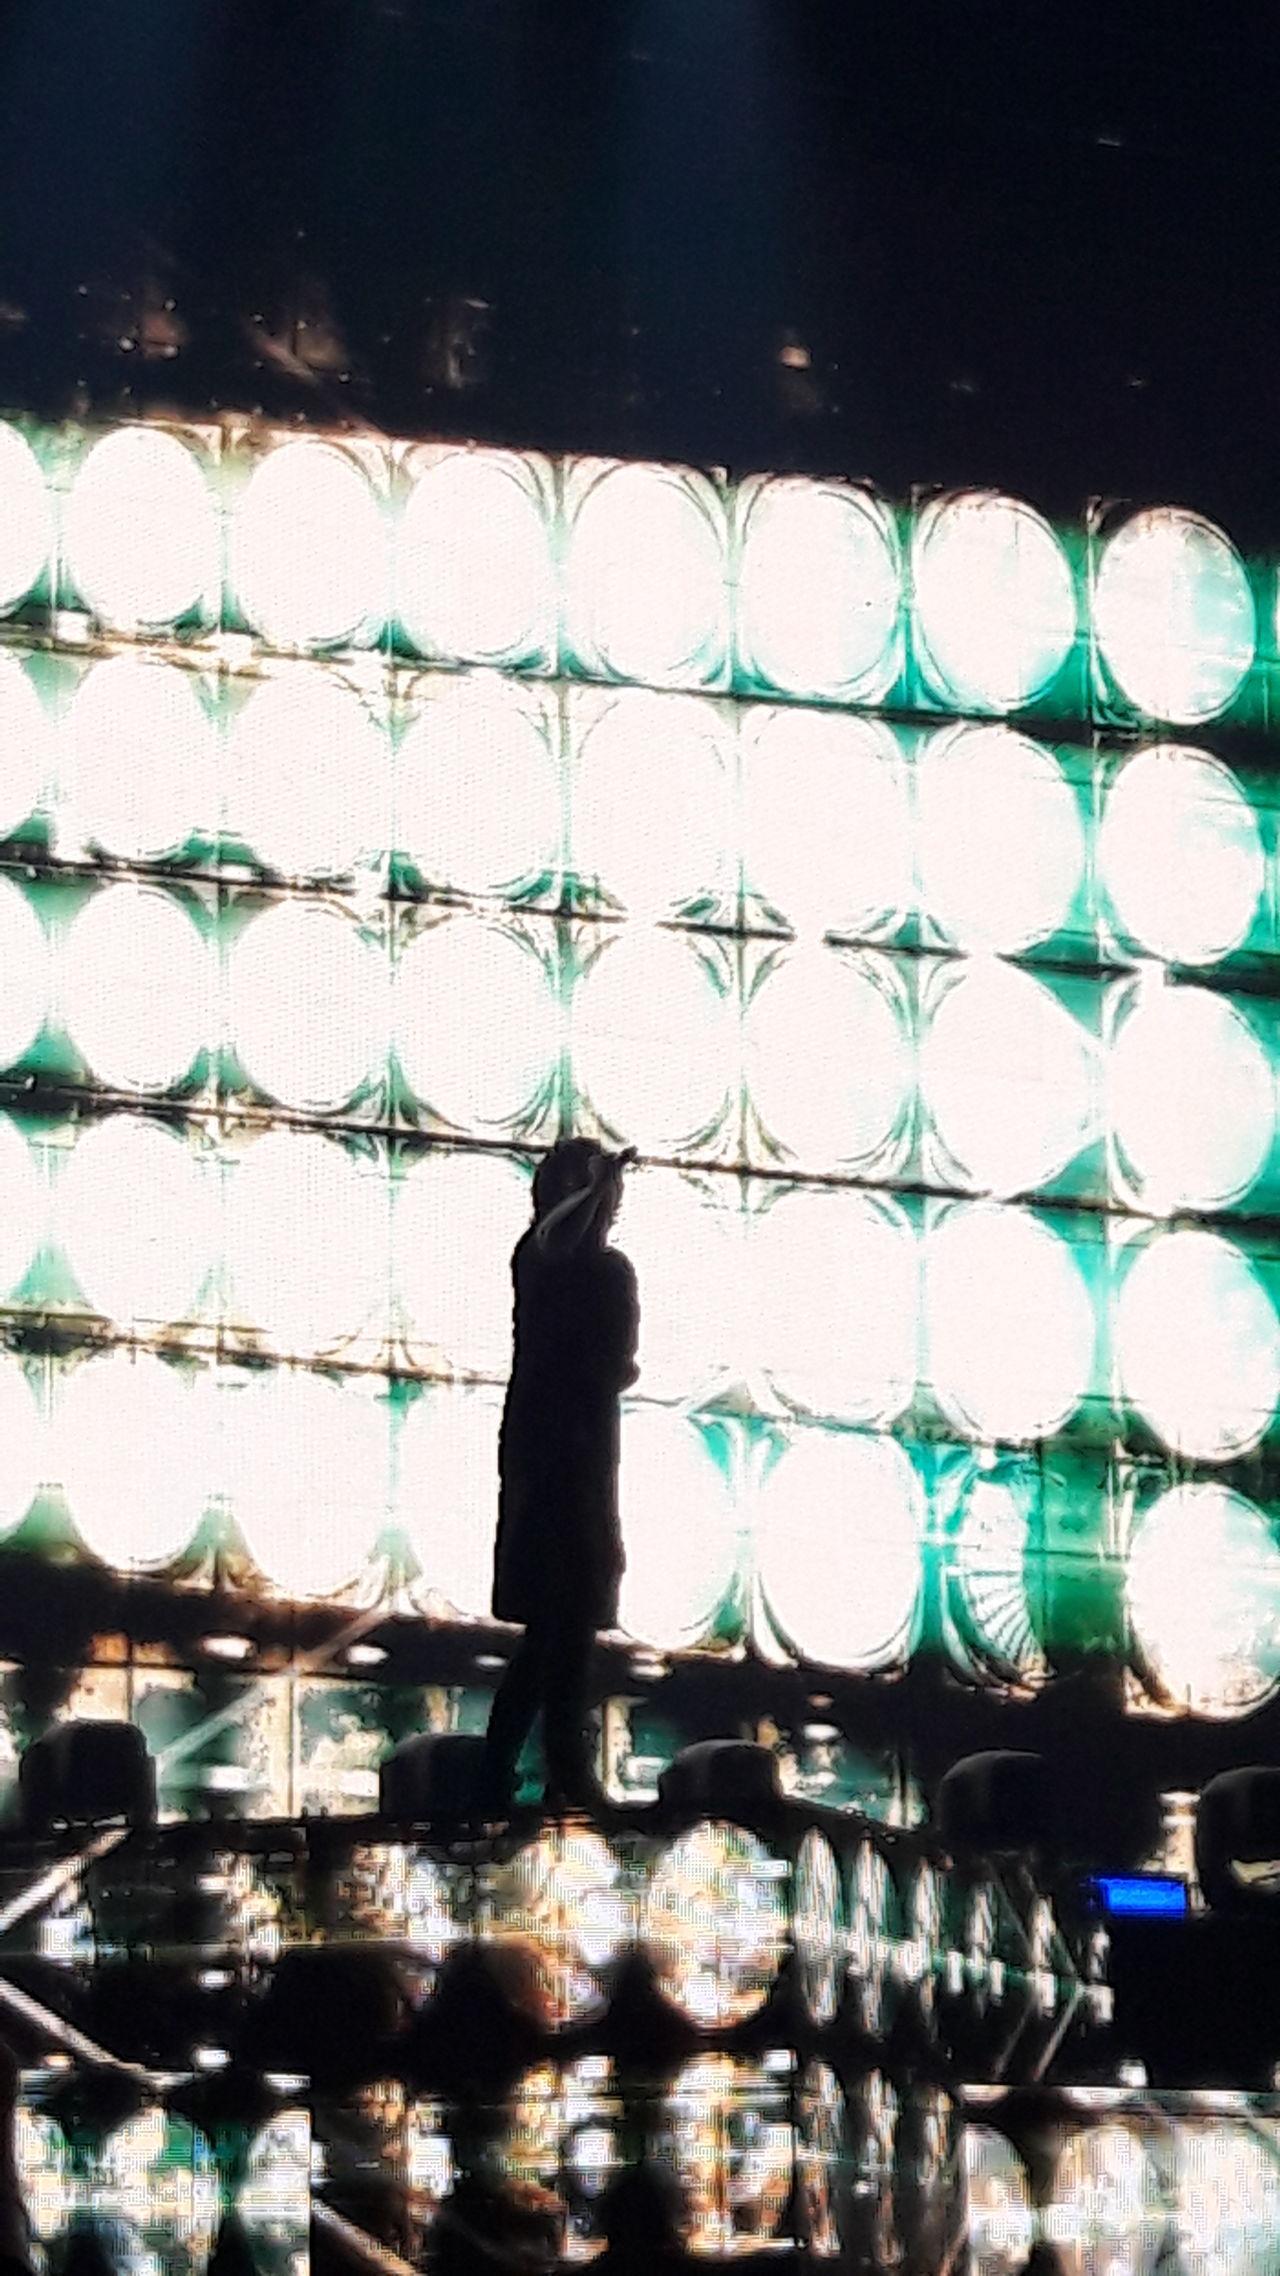 Singer  Singing Musician Real People Metal Grate Concert O2 Arena First Eyeem Photo